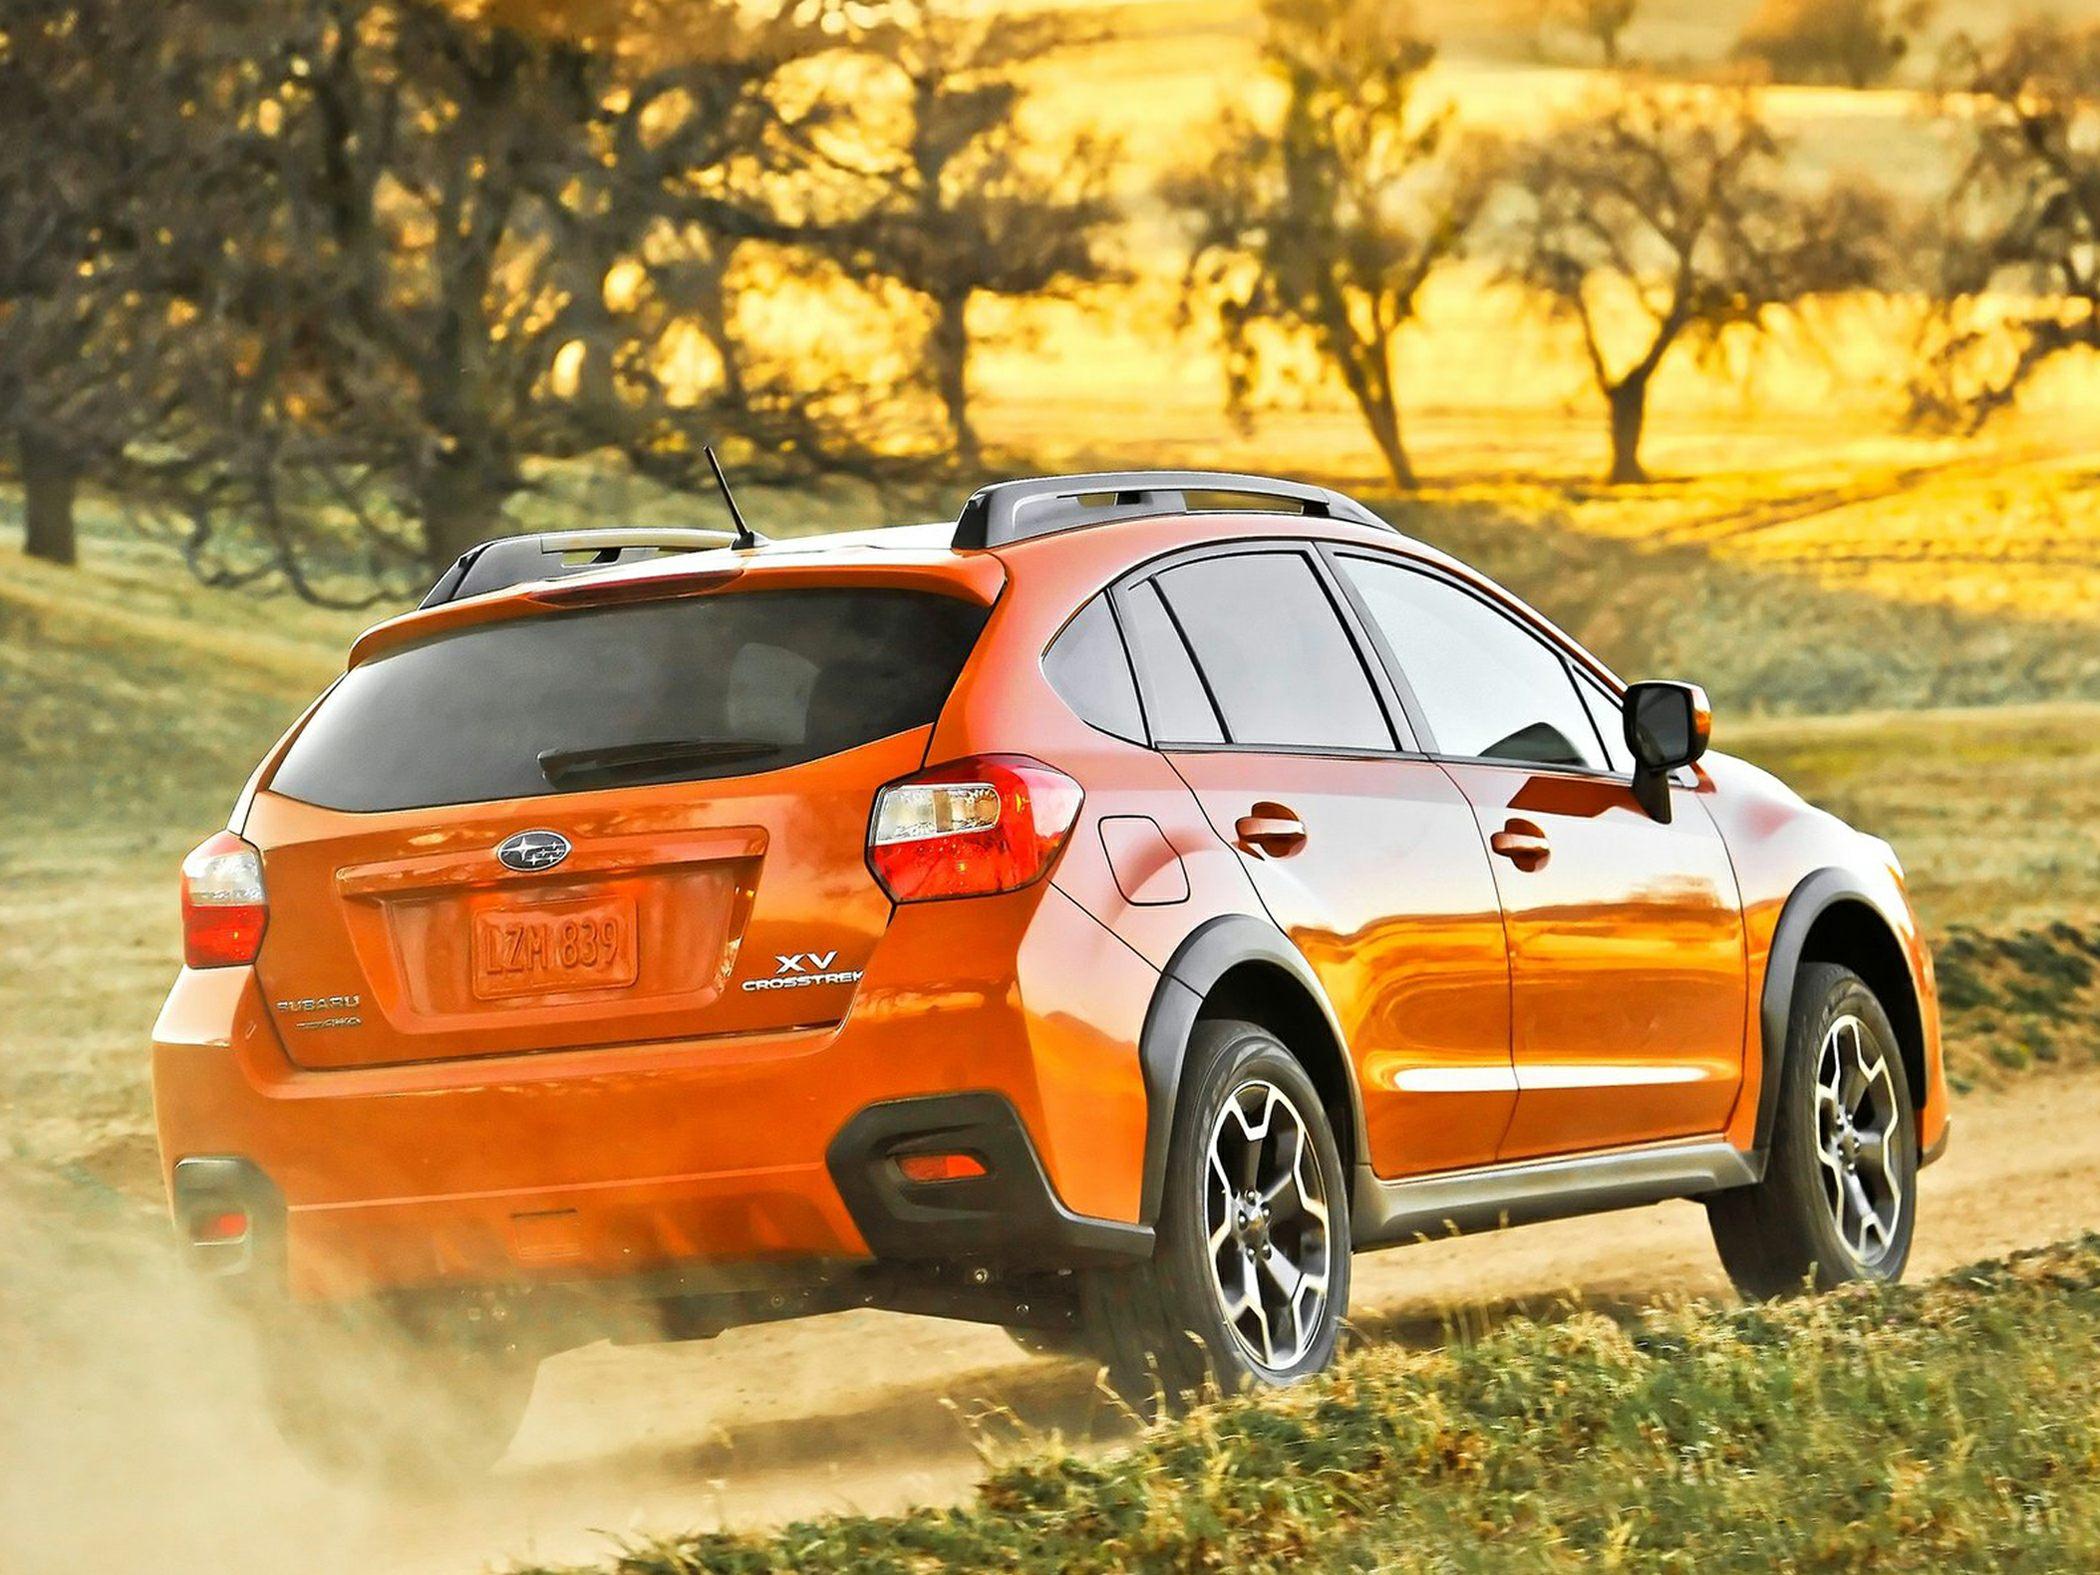 2014 Subaru XV Crosstrek Glamour